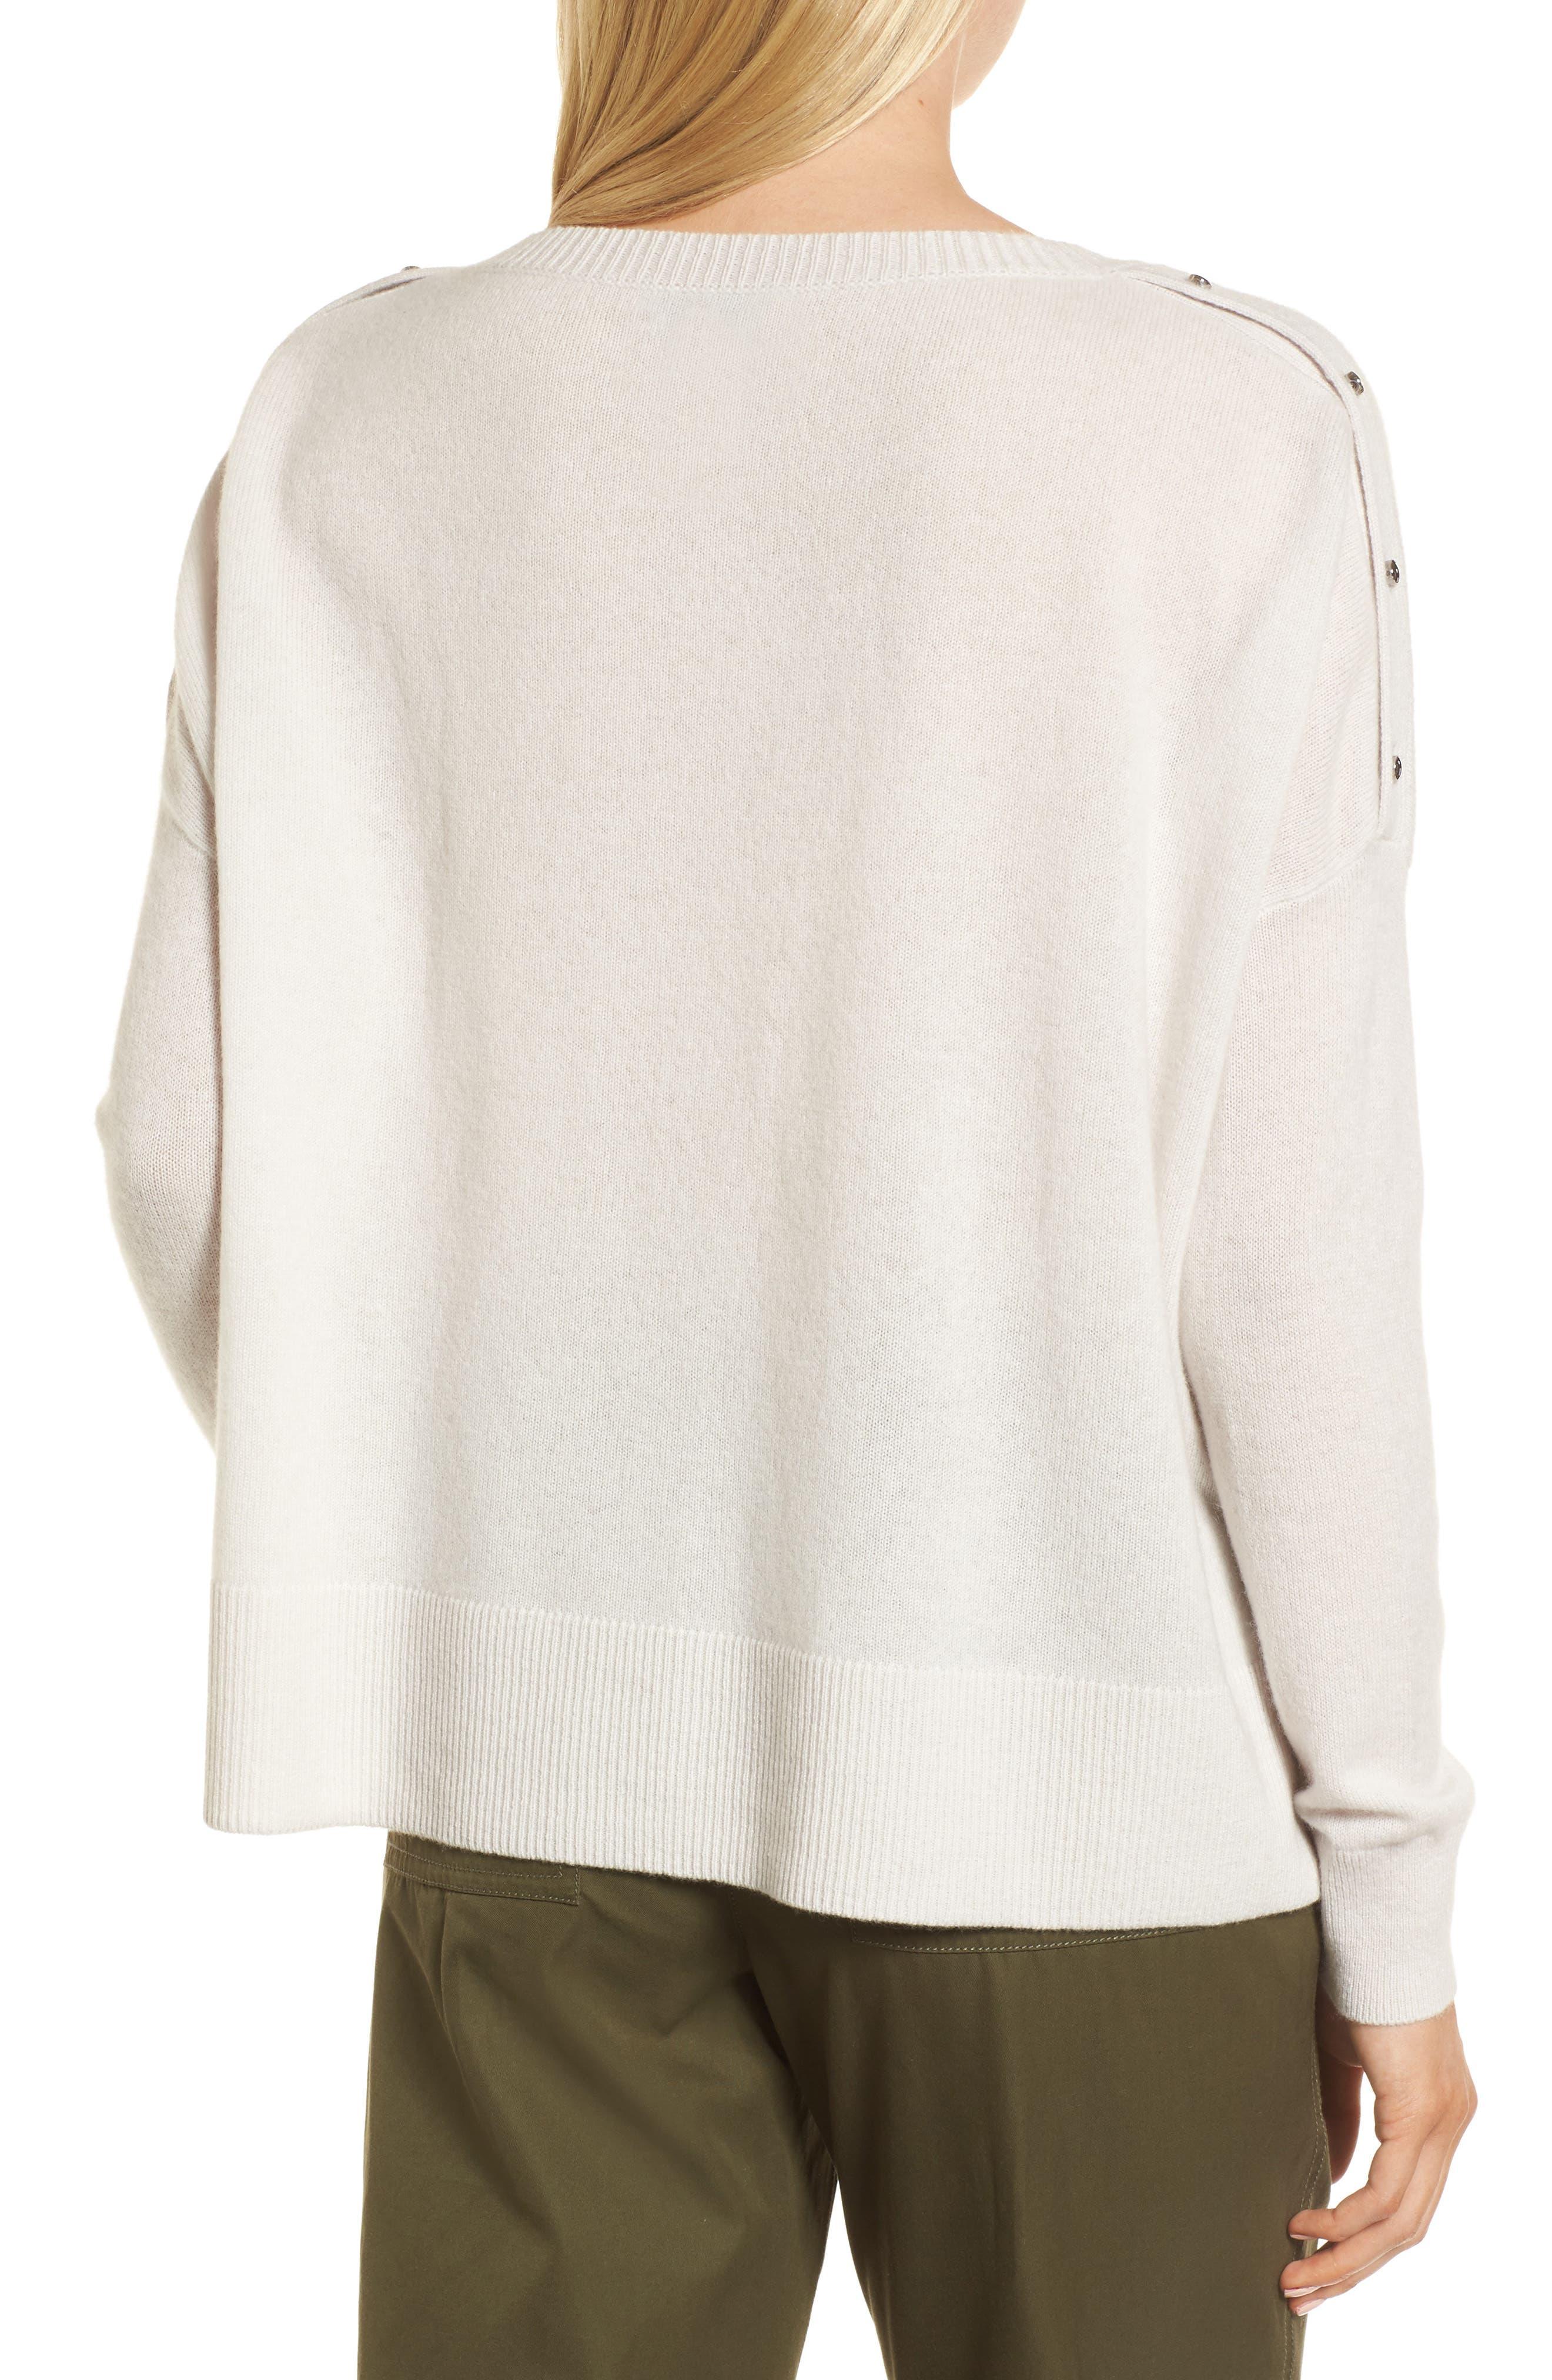 Button Detail Cashmere Sweater,                             Alternate thumbnail 2, color,                             Beige Pumice